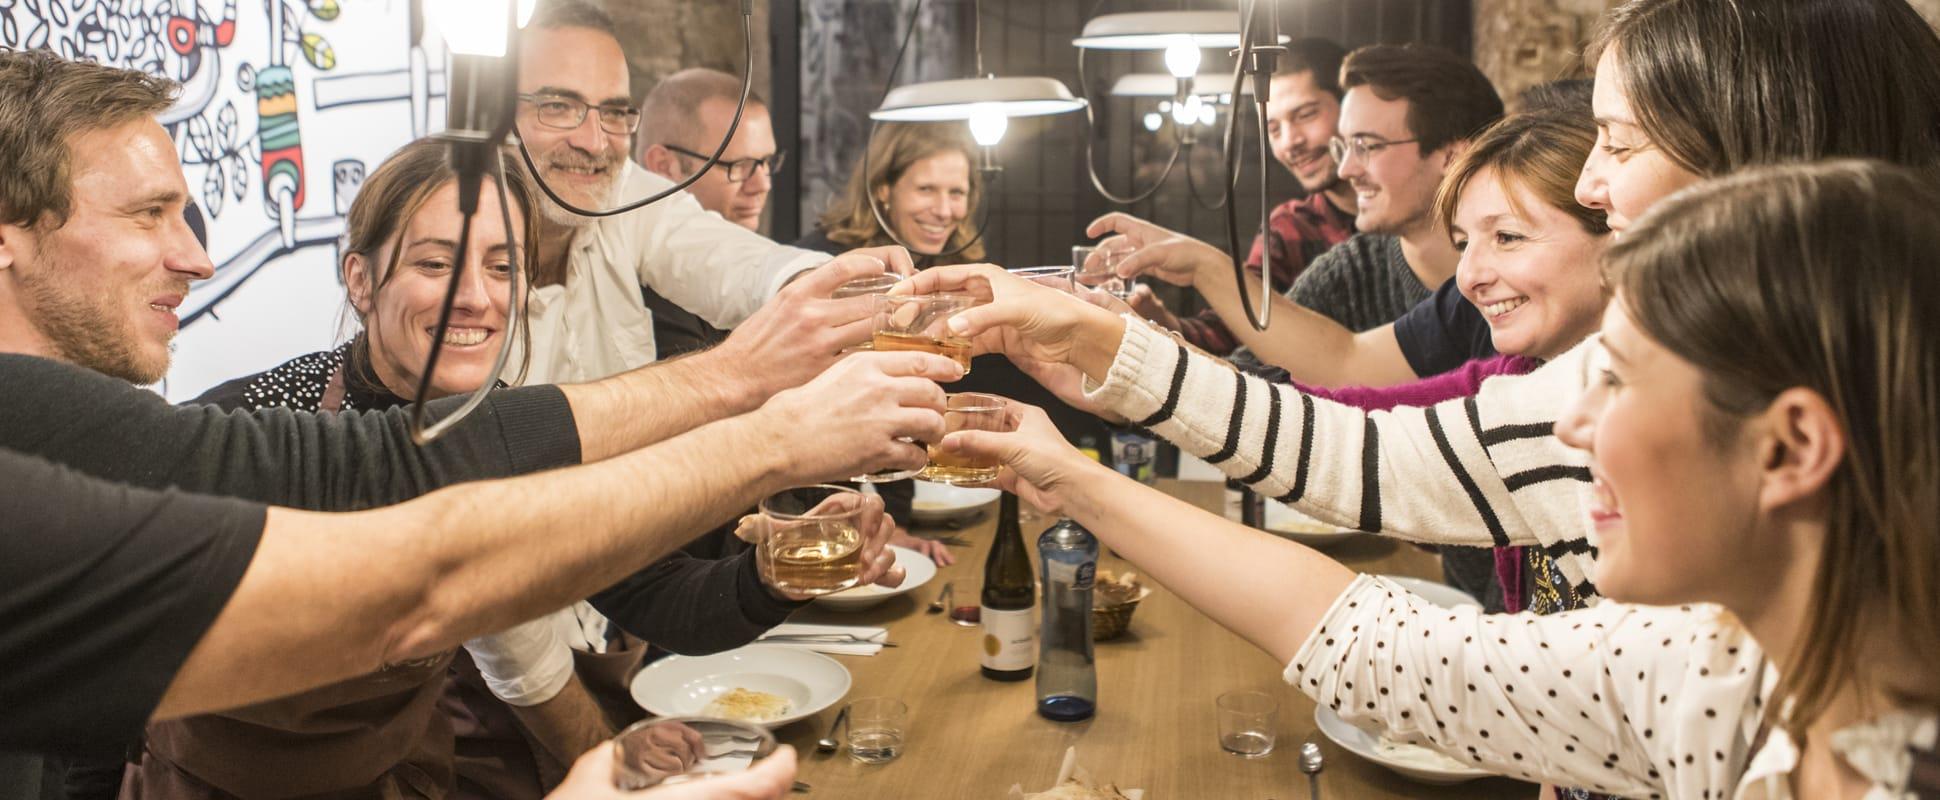 Cook&Taste - Study Abroad Programs